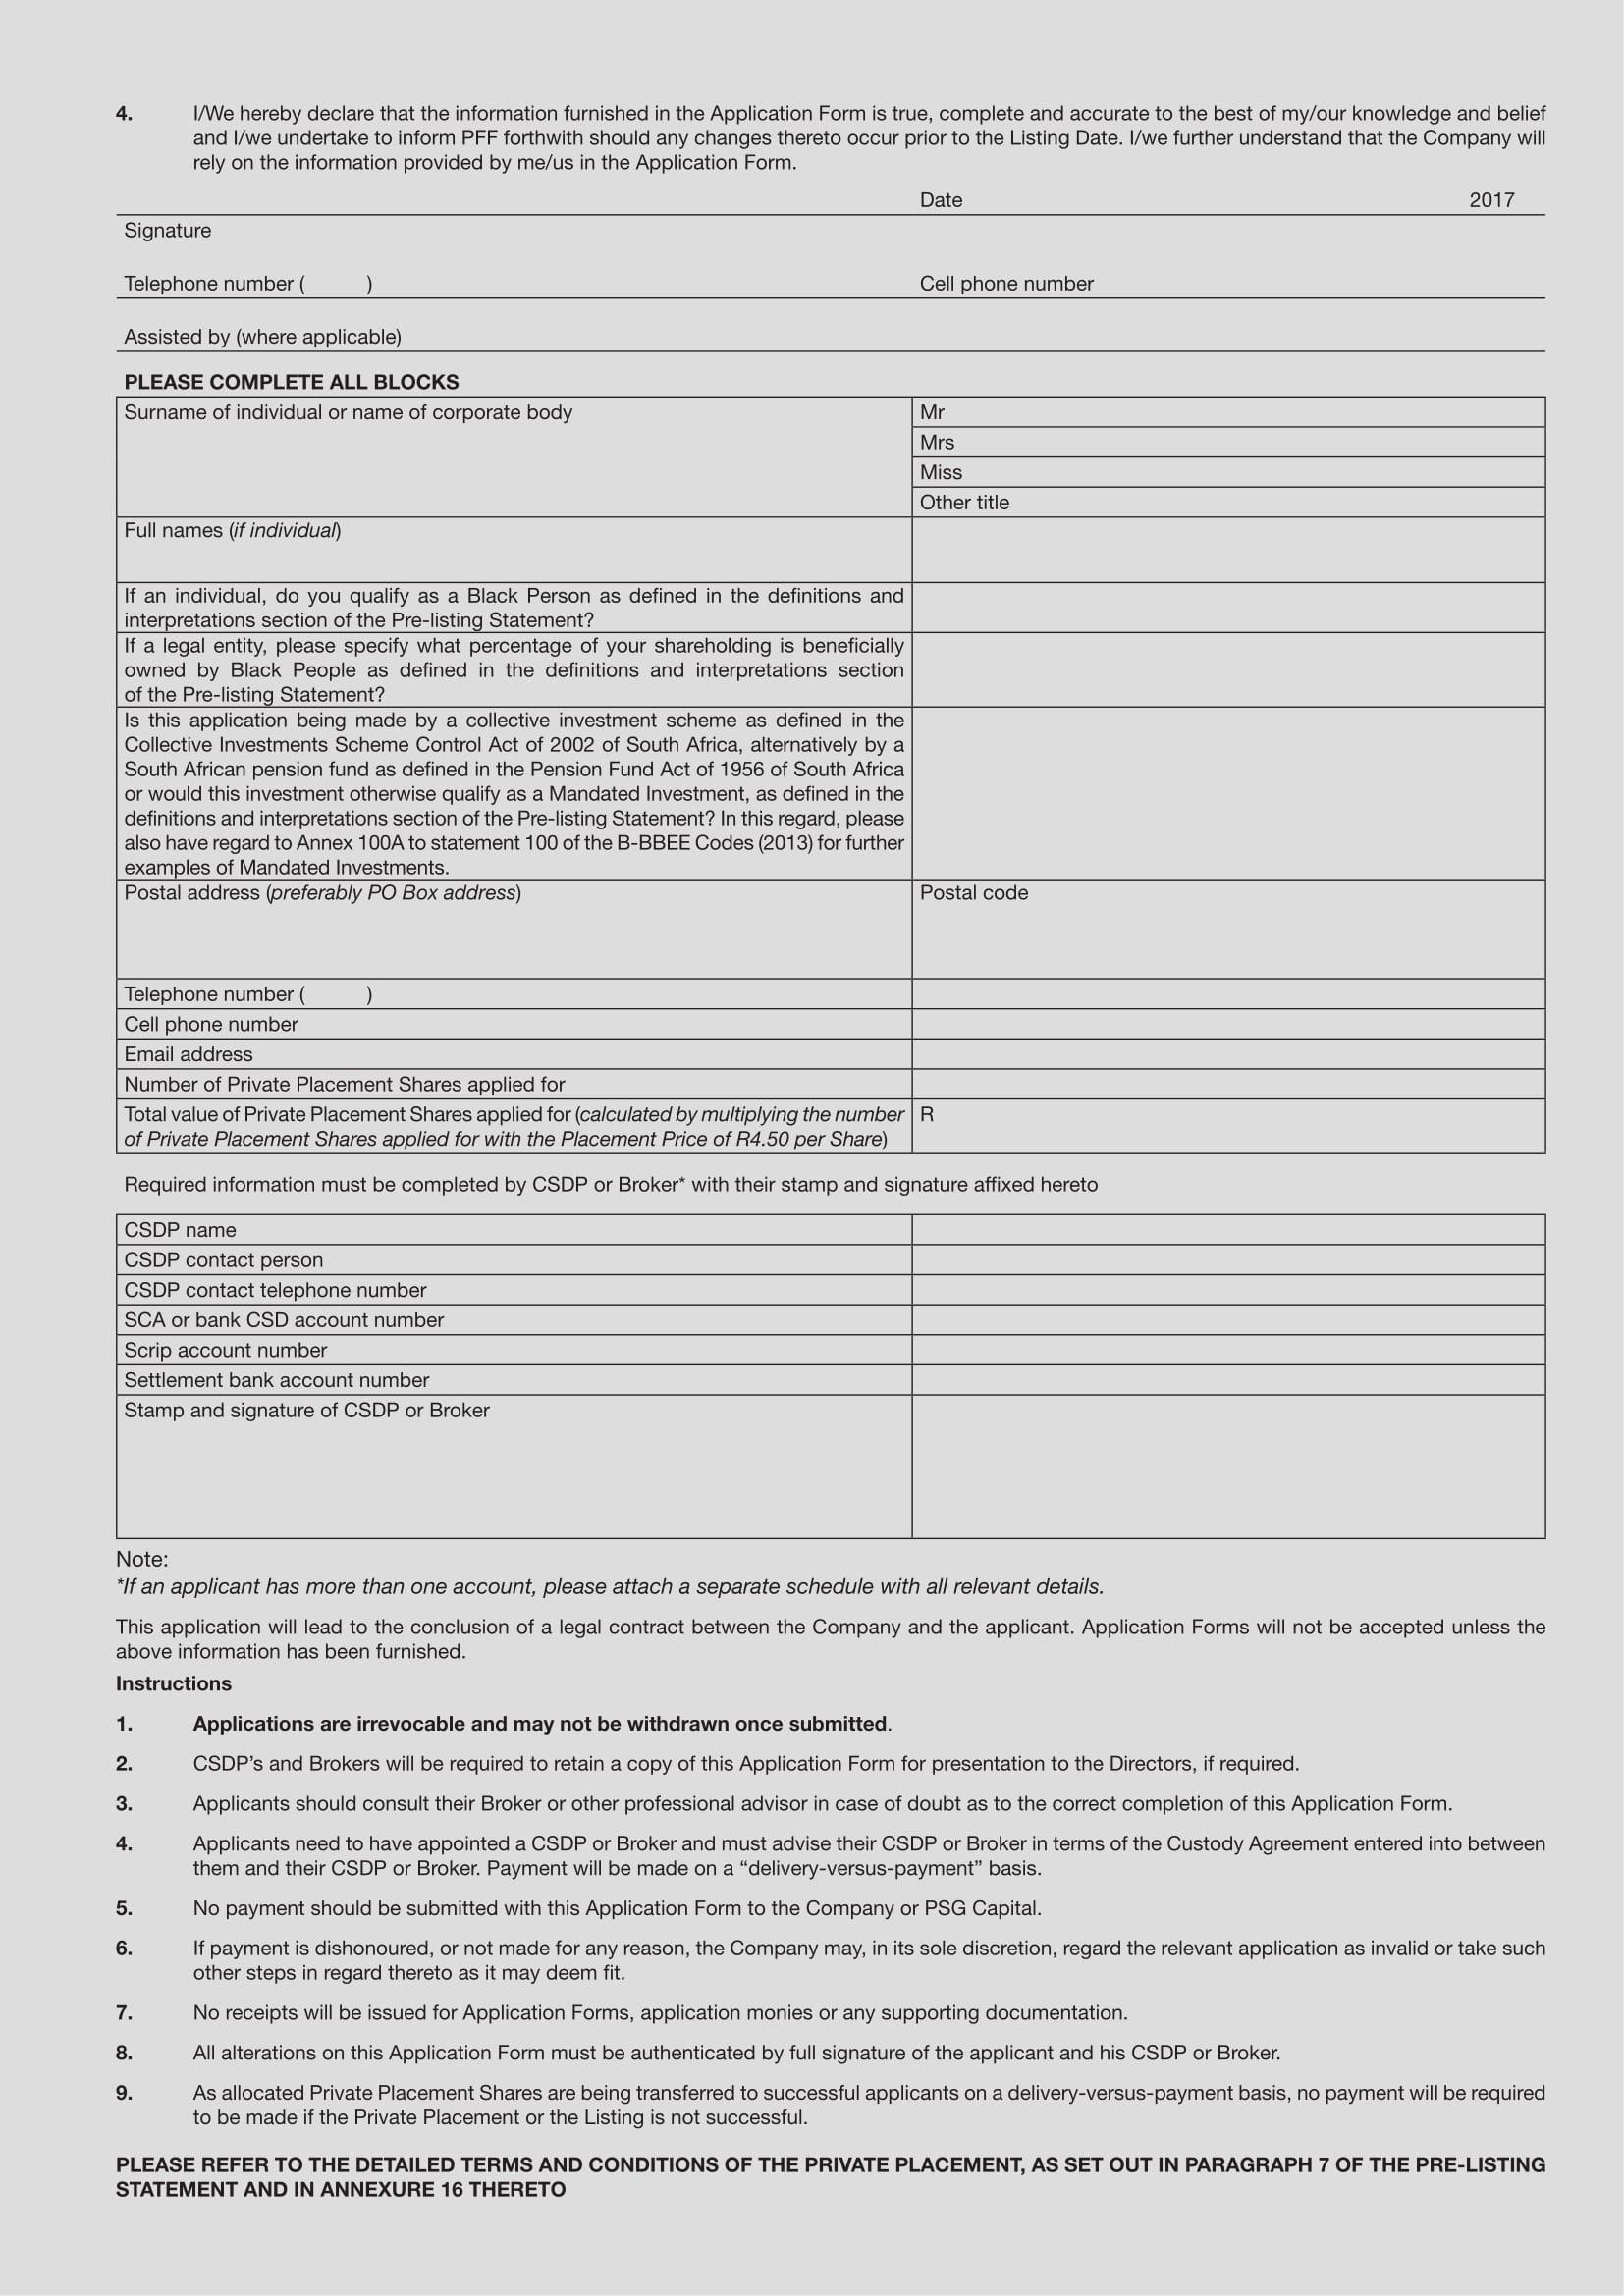 premier food fishing ltd private placement application form 1 2